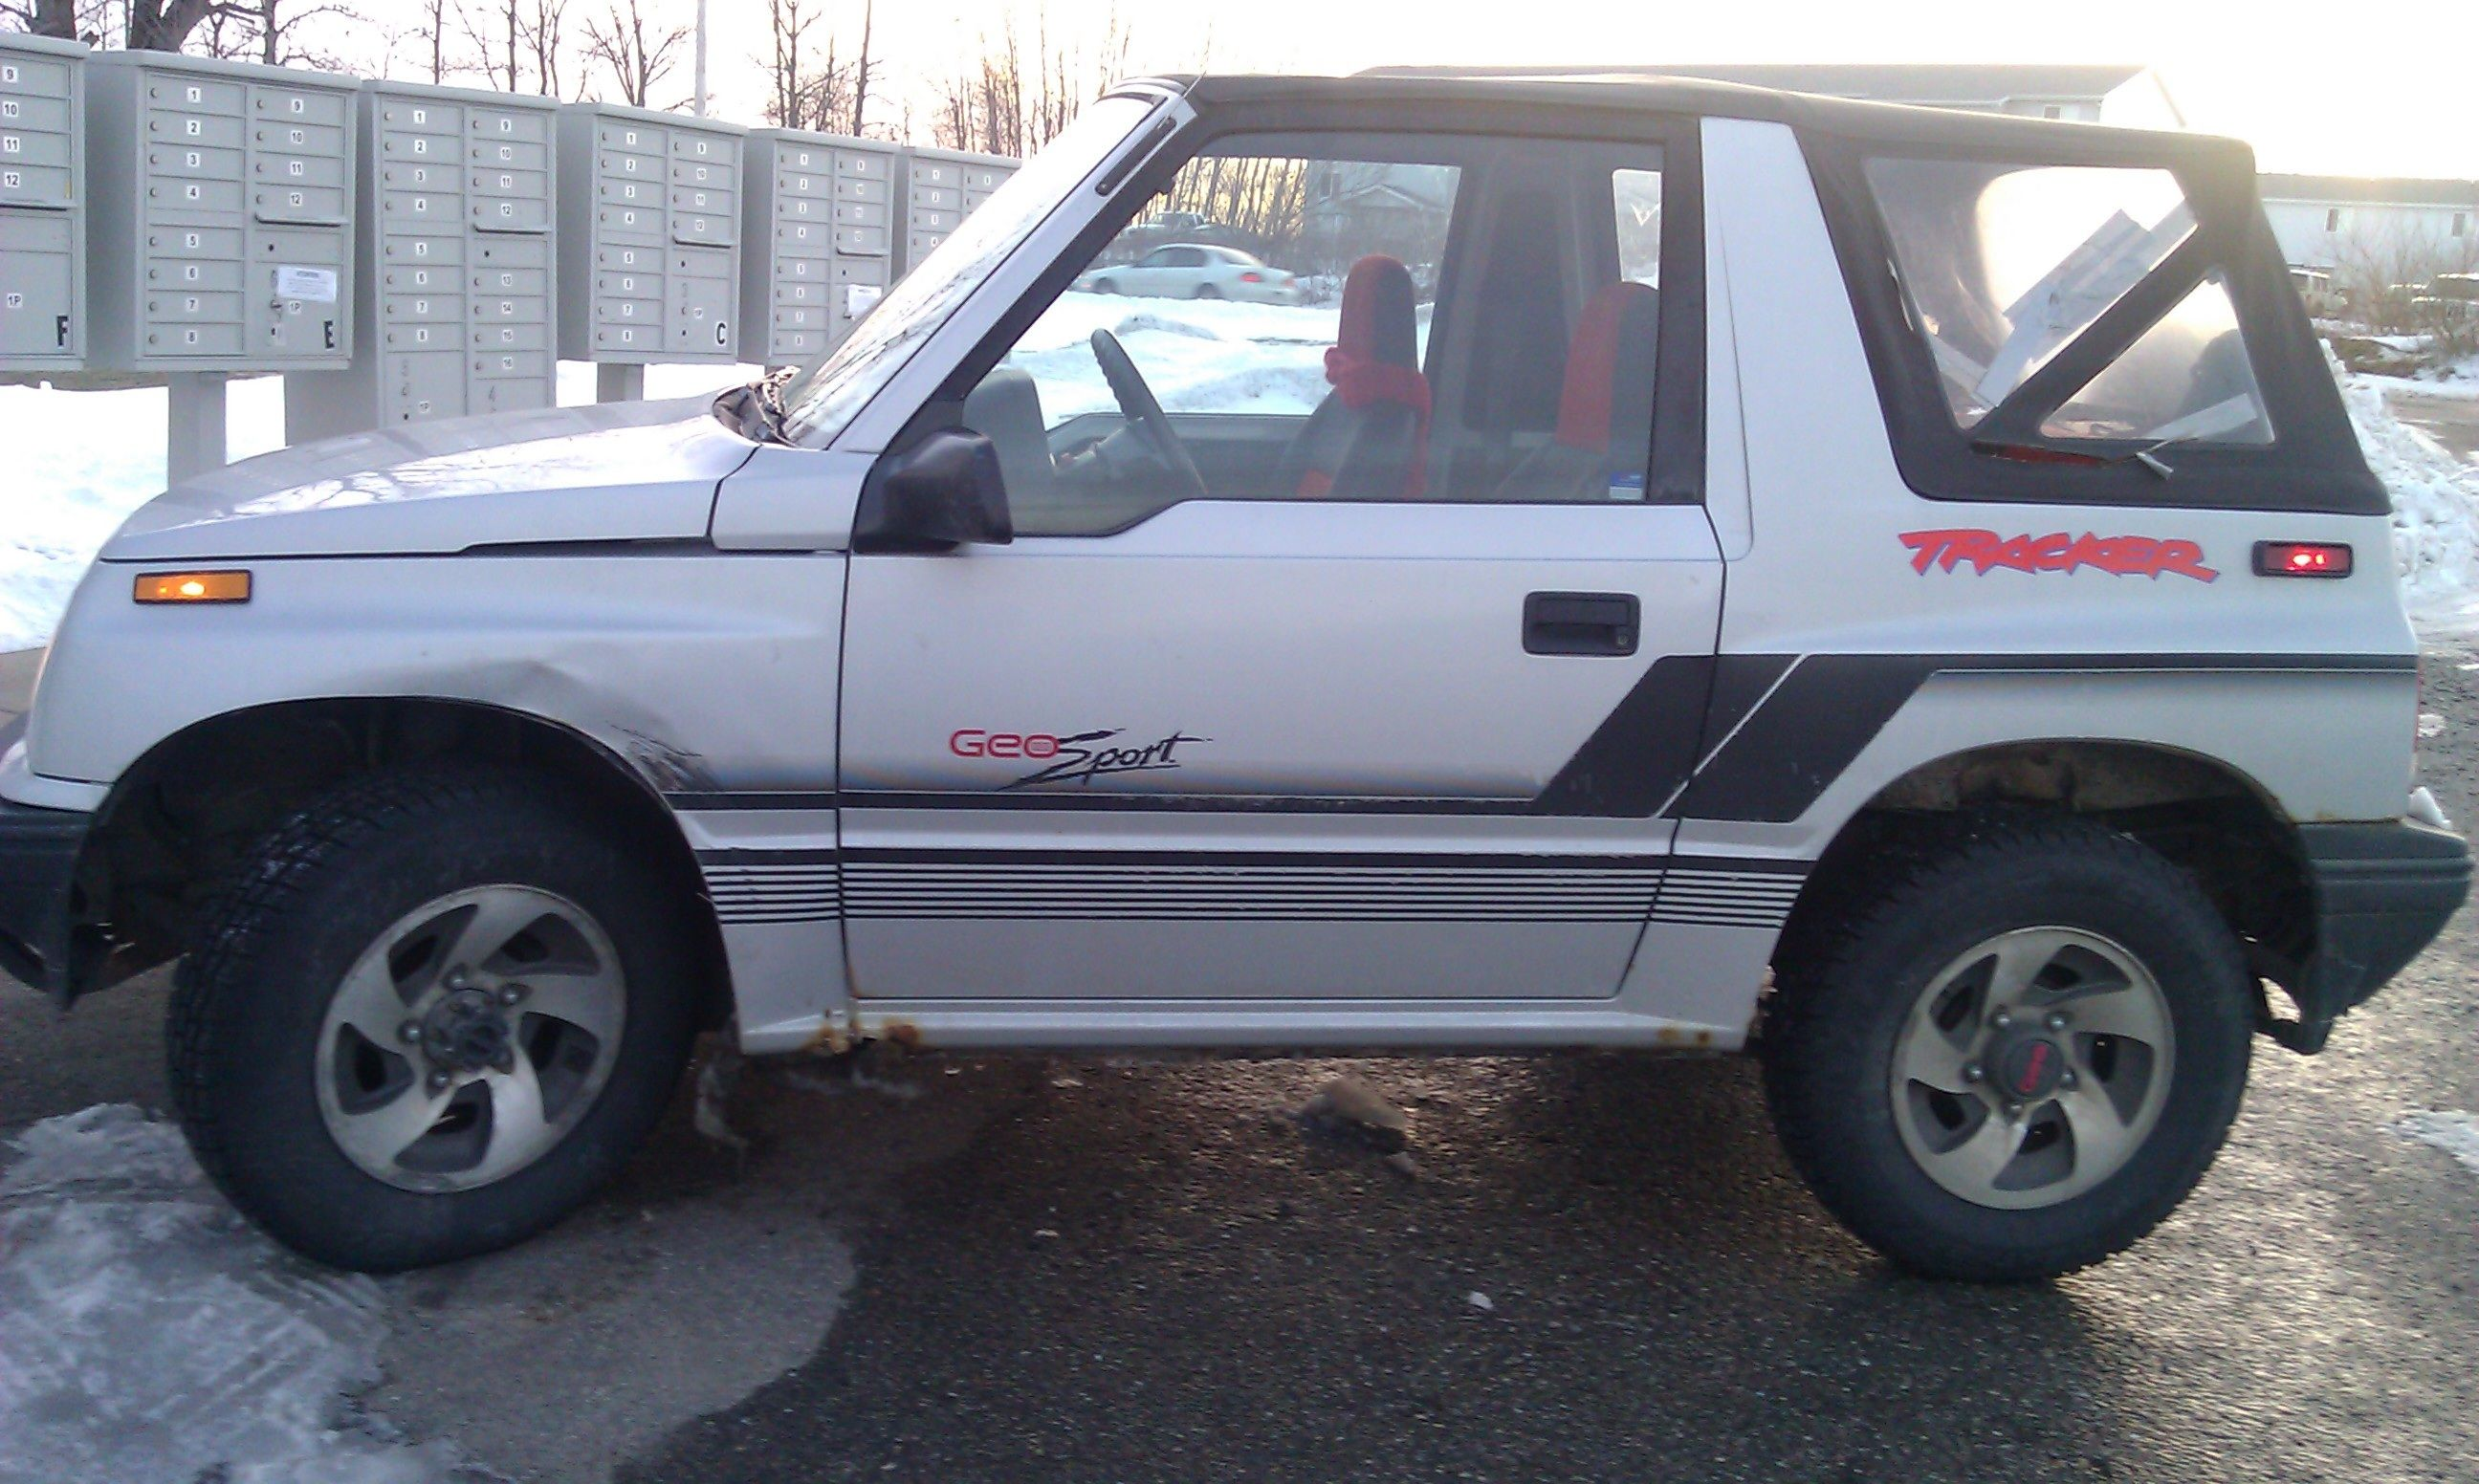 My One True Love My Geo Tracker S Car Suv Car Chevy